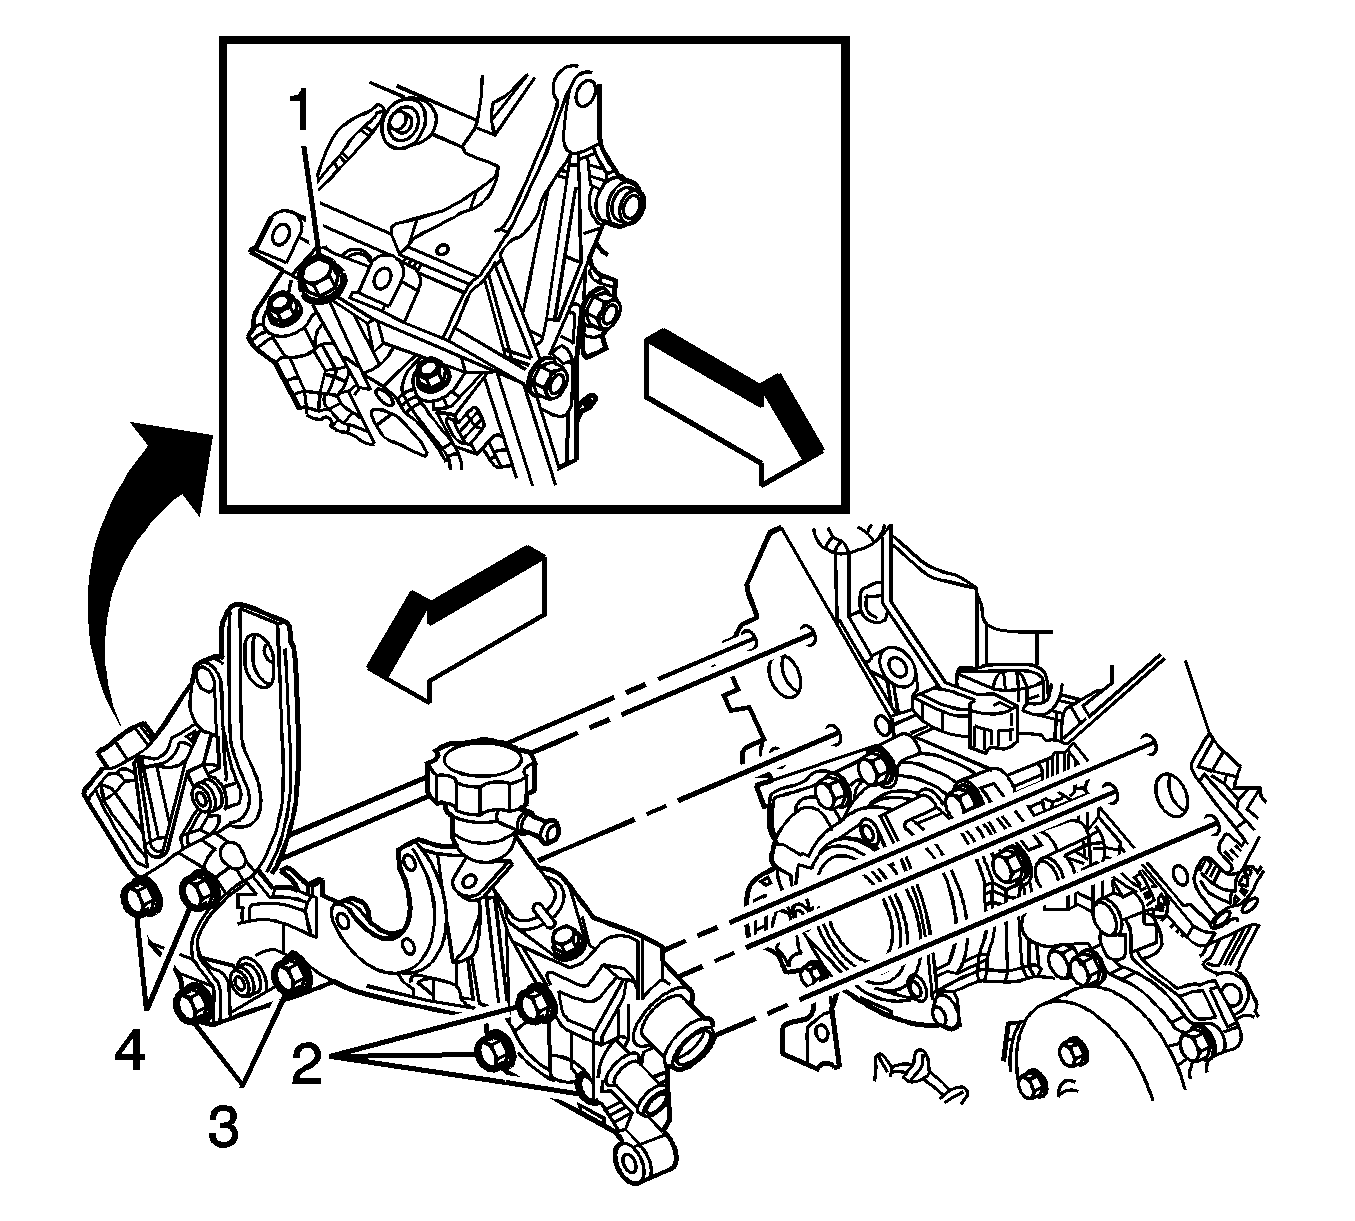 hight resolution of 2006 impala engine diagram